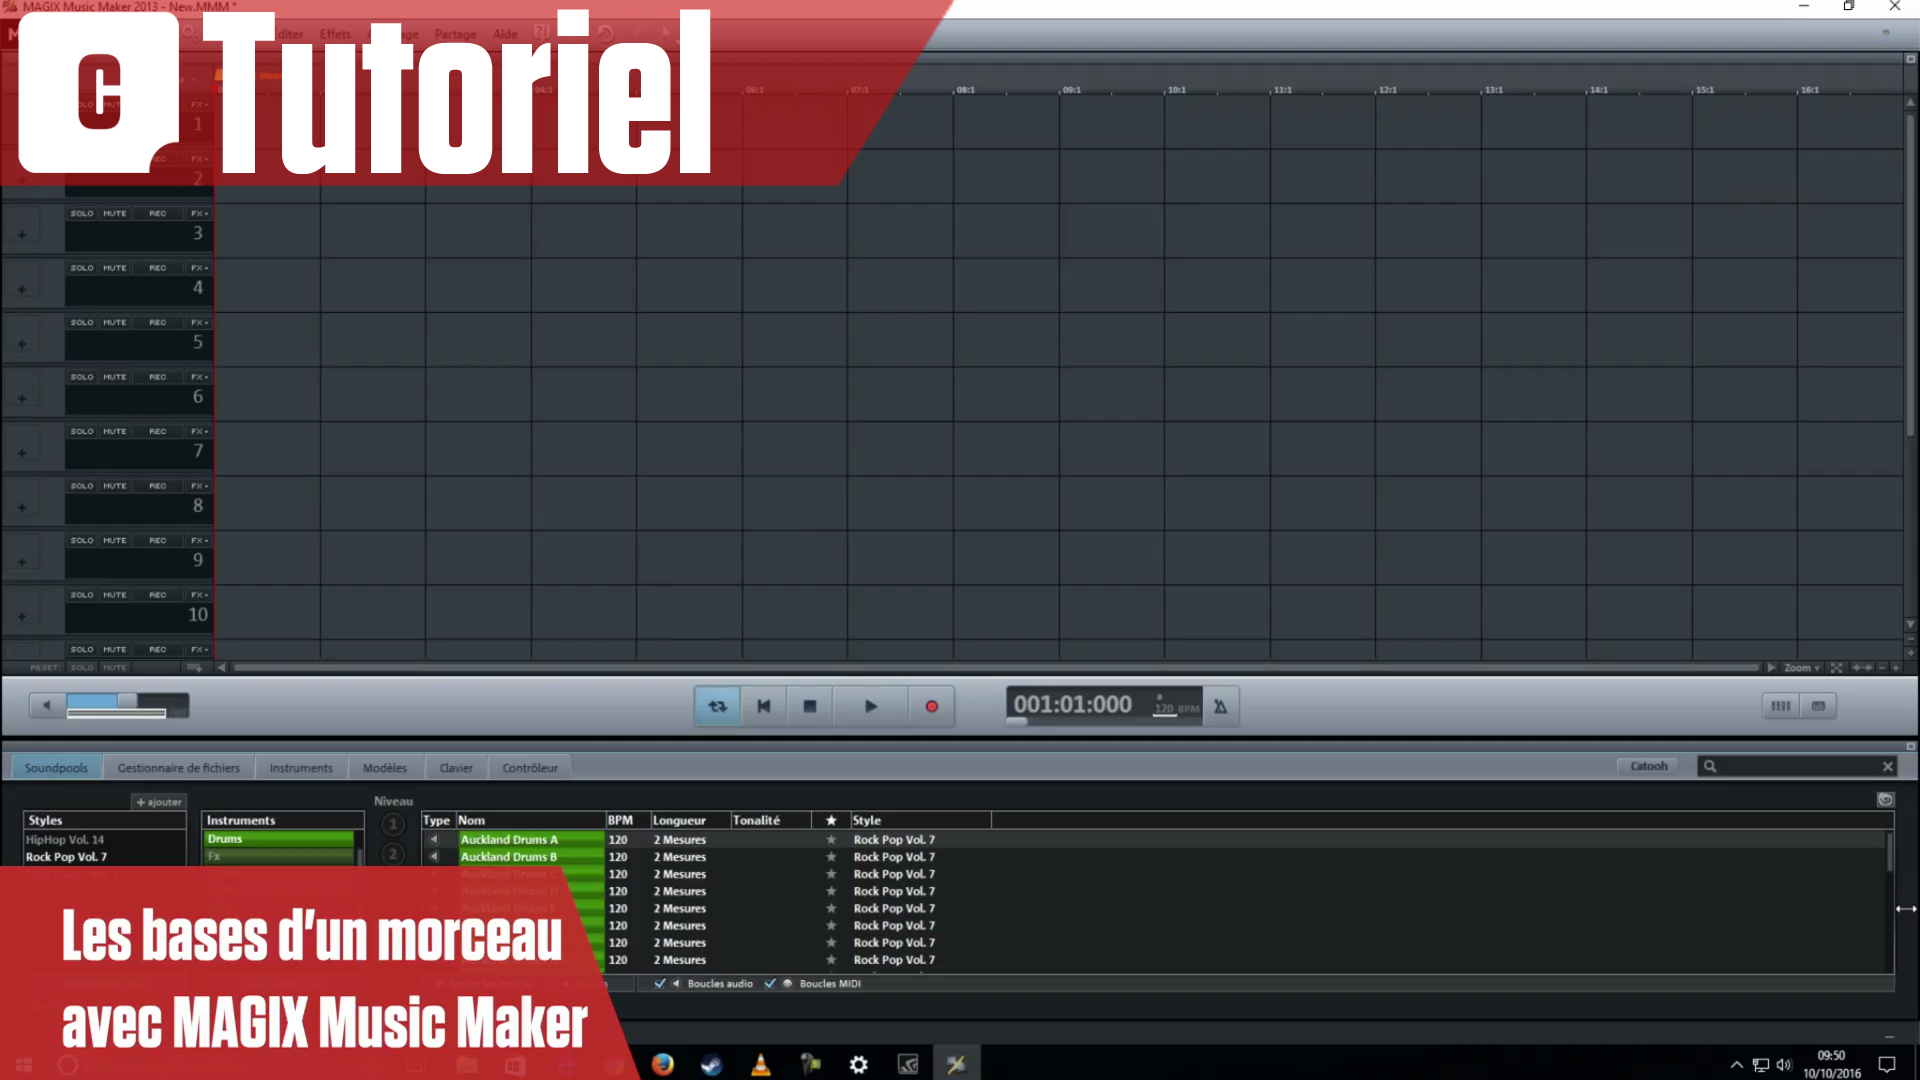 magix music maker 2013 clubic